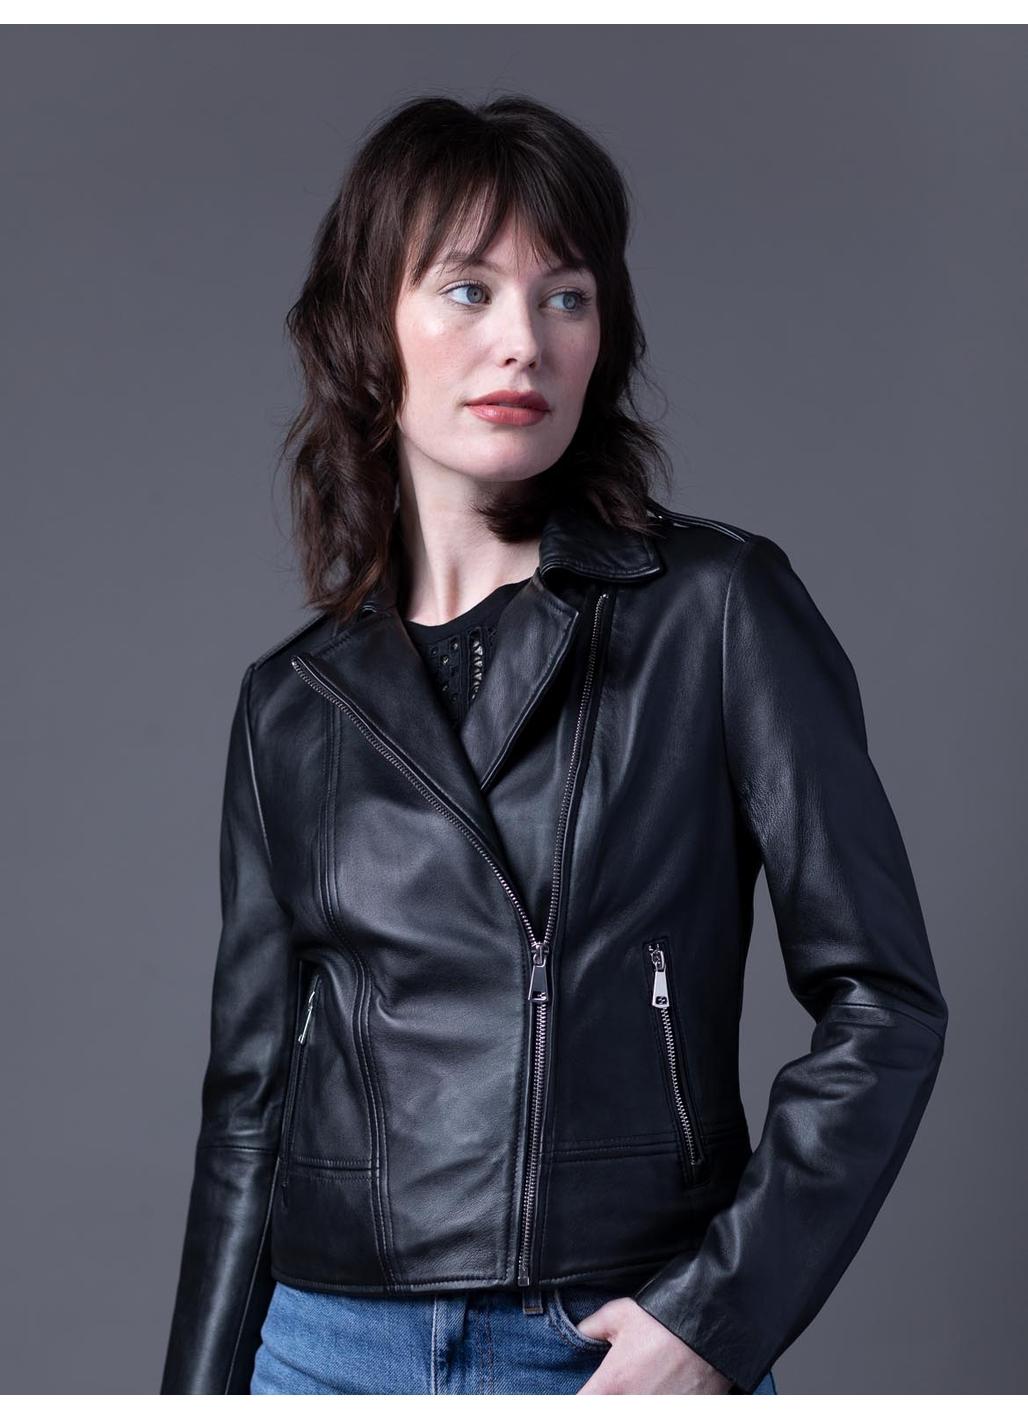 Classic Leather Biker Jacket in Black